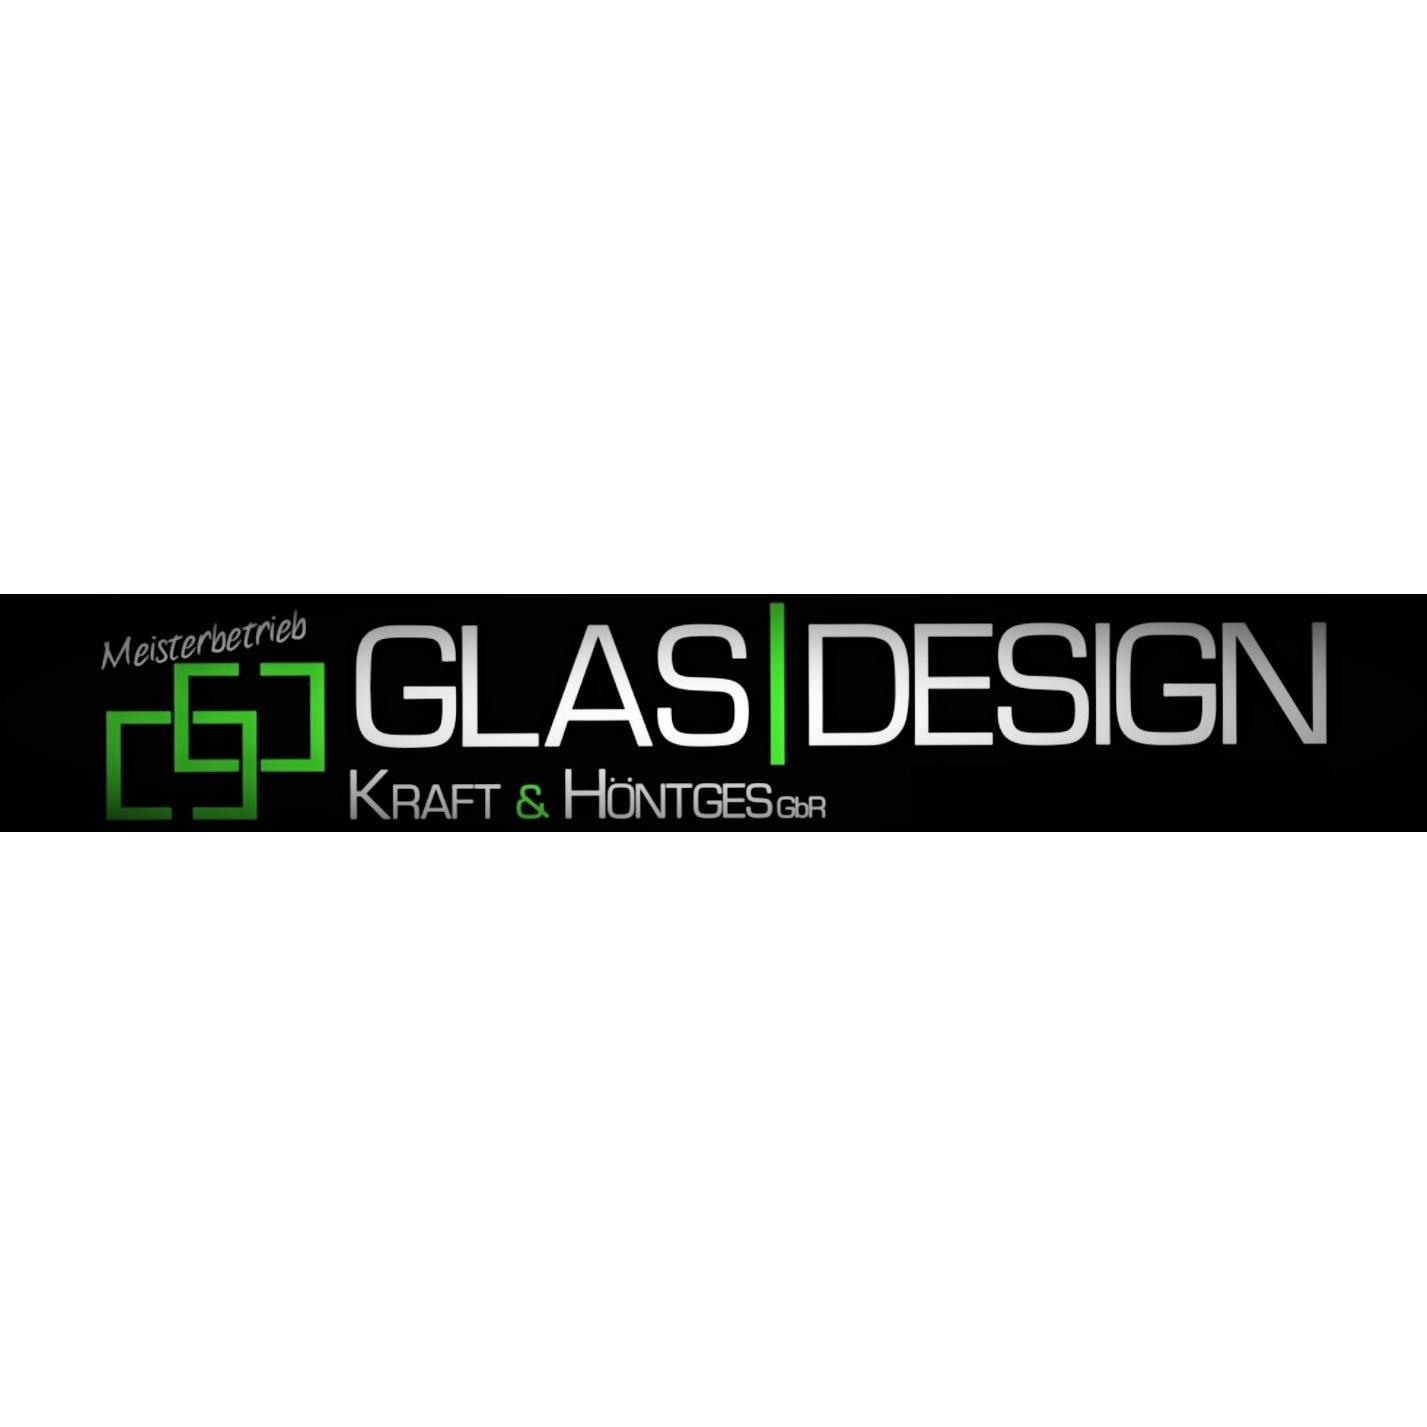 Bild zu K&H Glasdesign Kraft & Höntges GbR in Kaarst